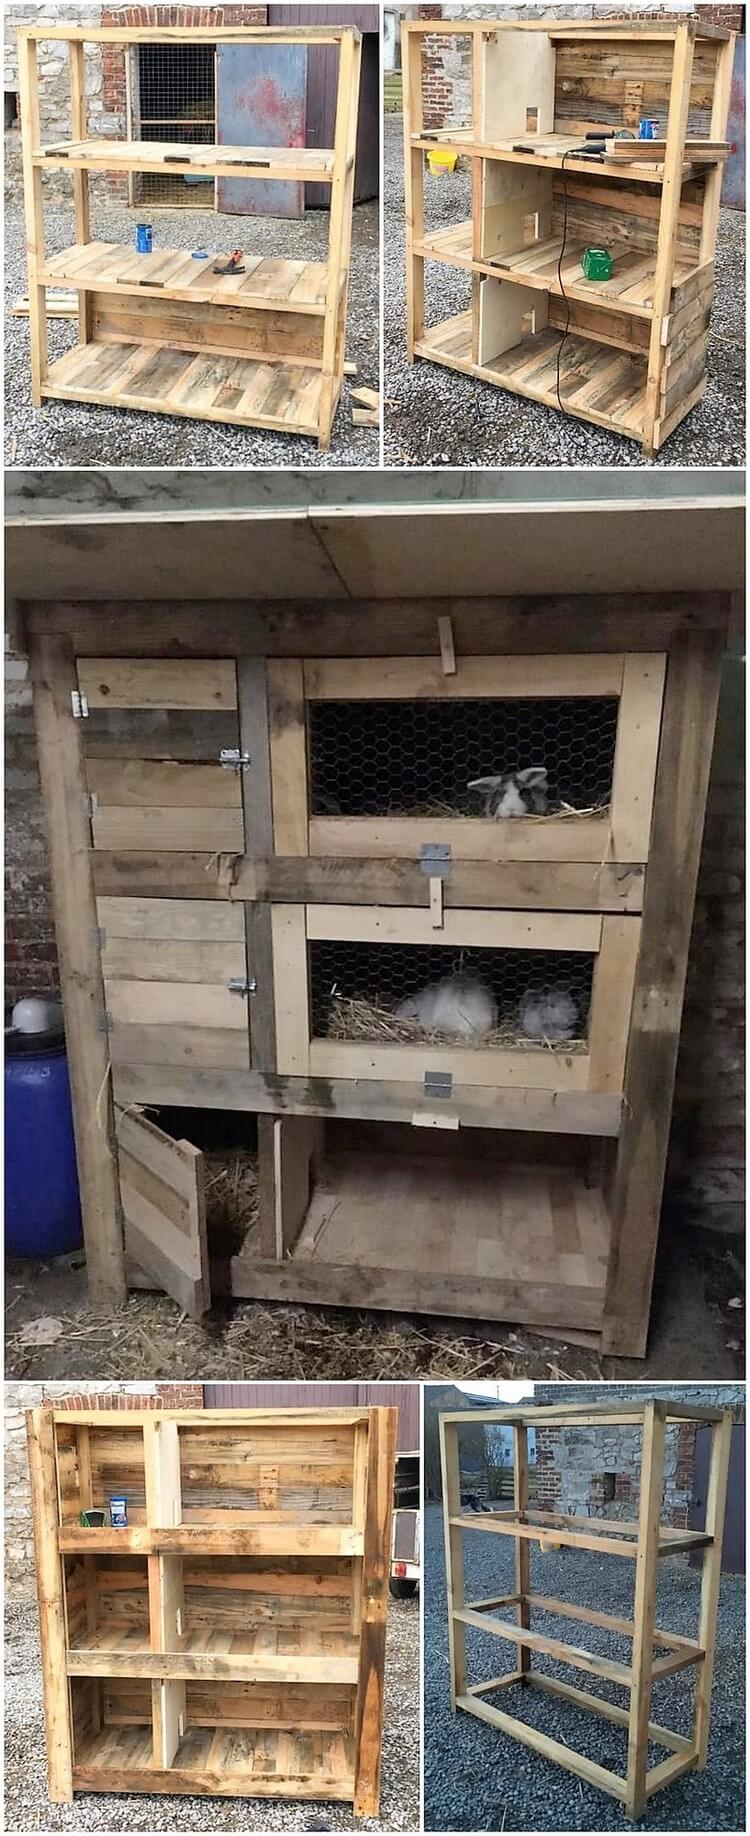 DIY Pallet Rabbit Hutch